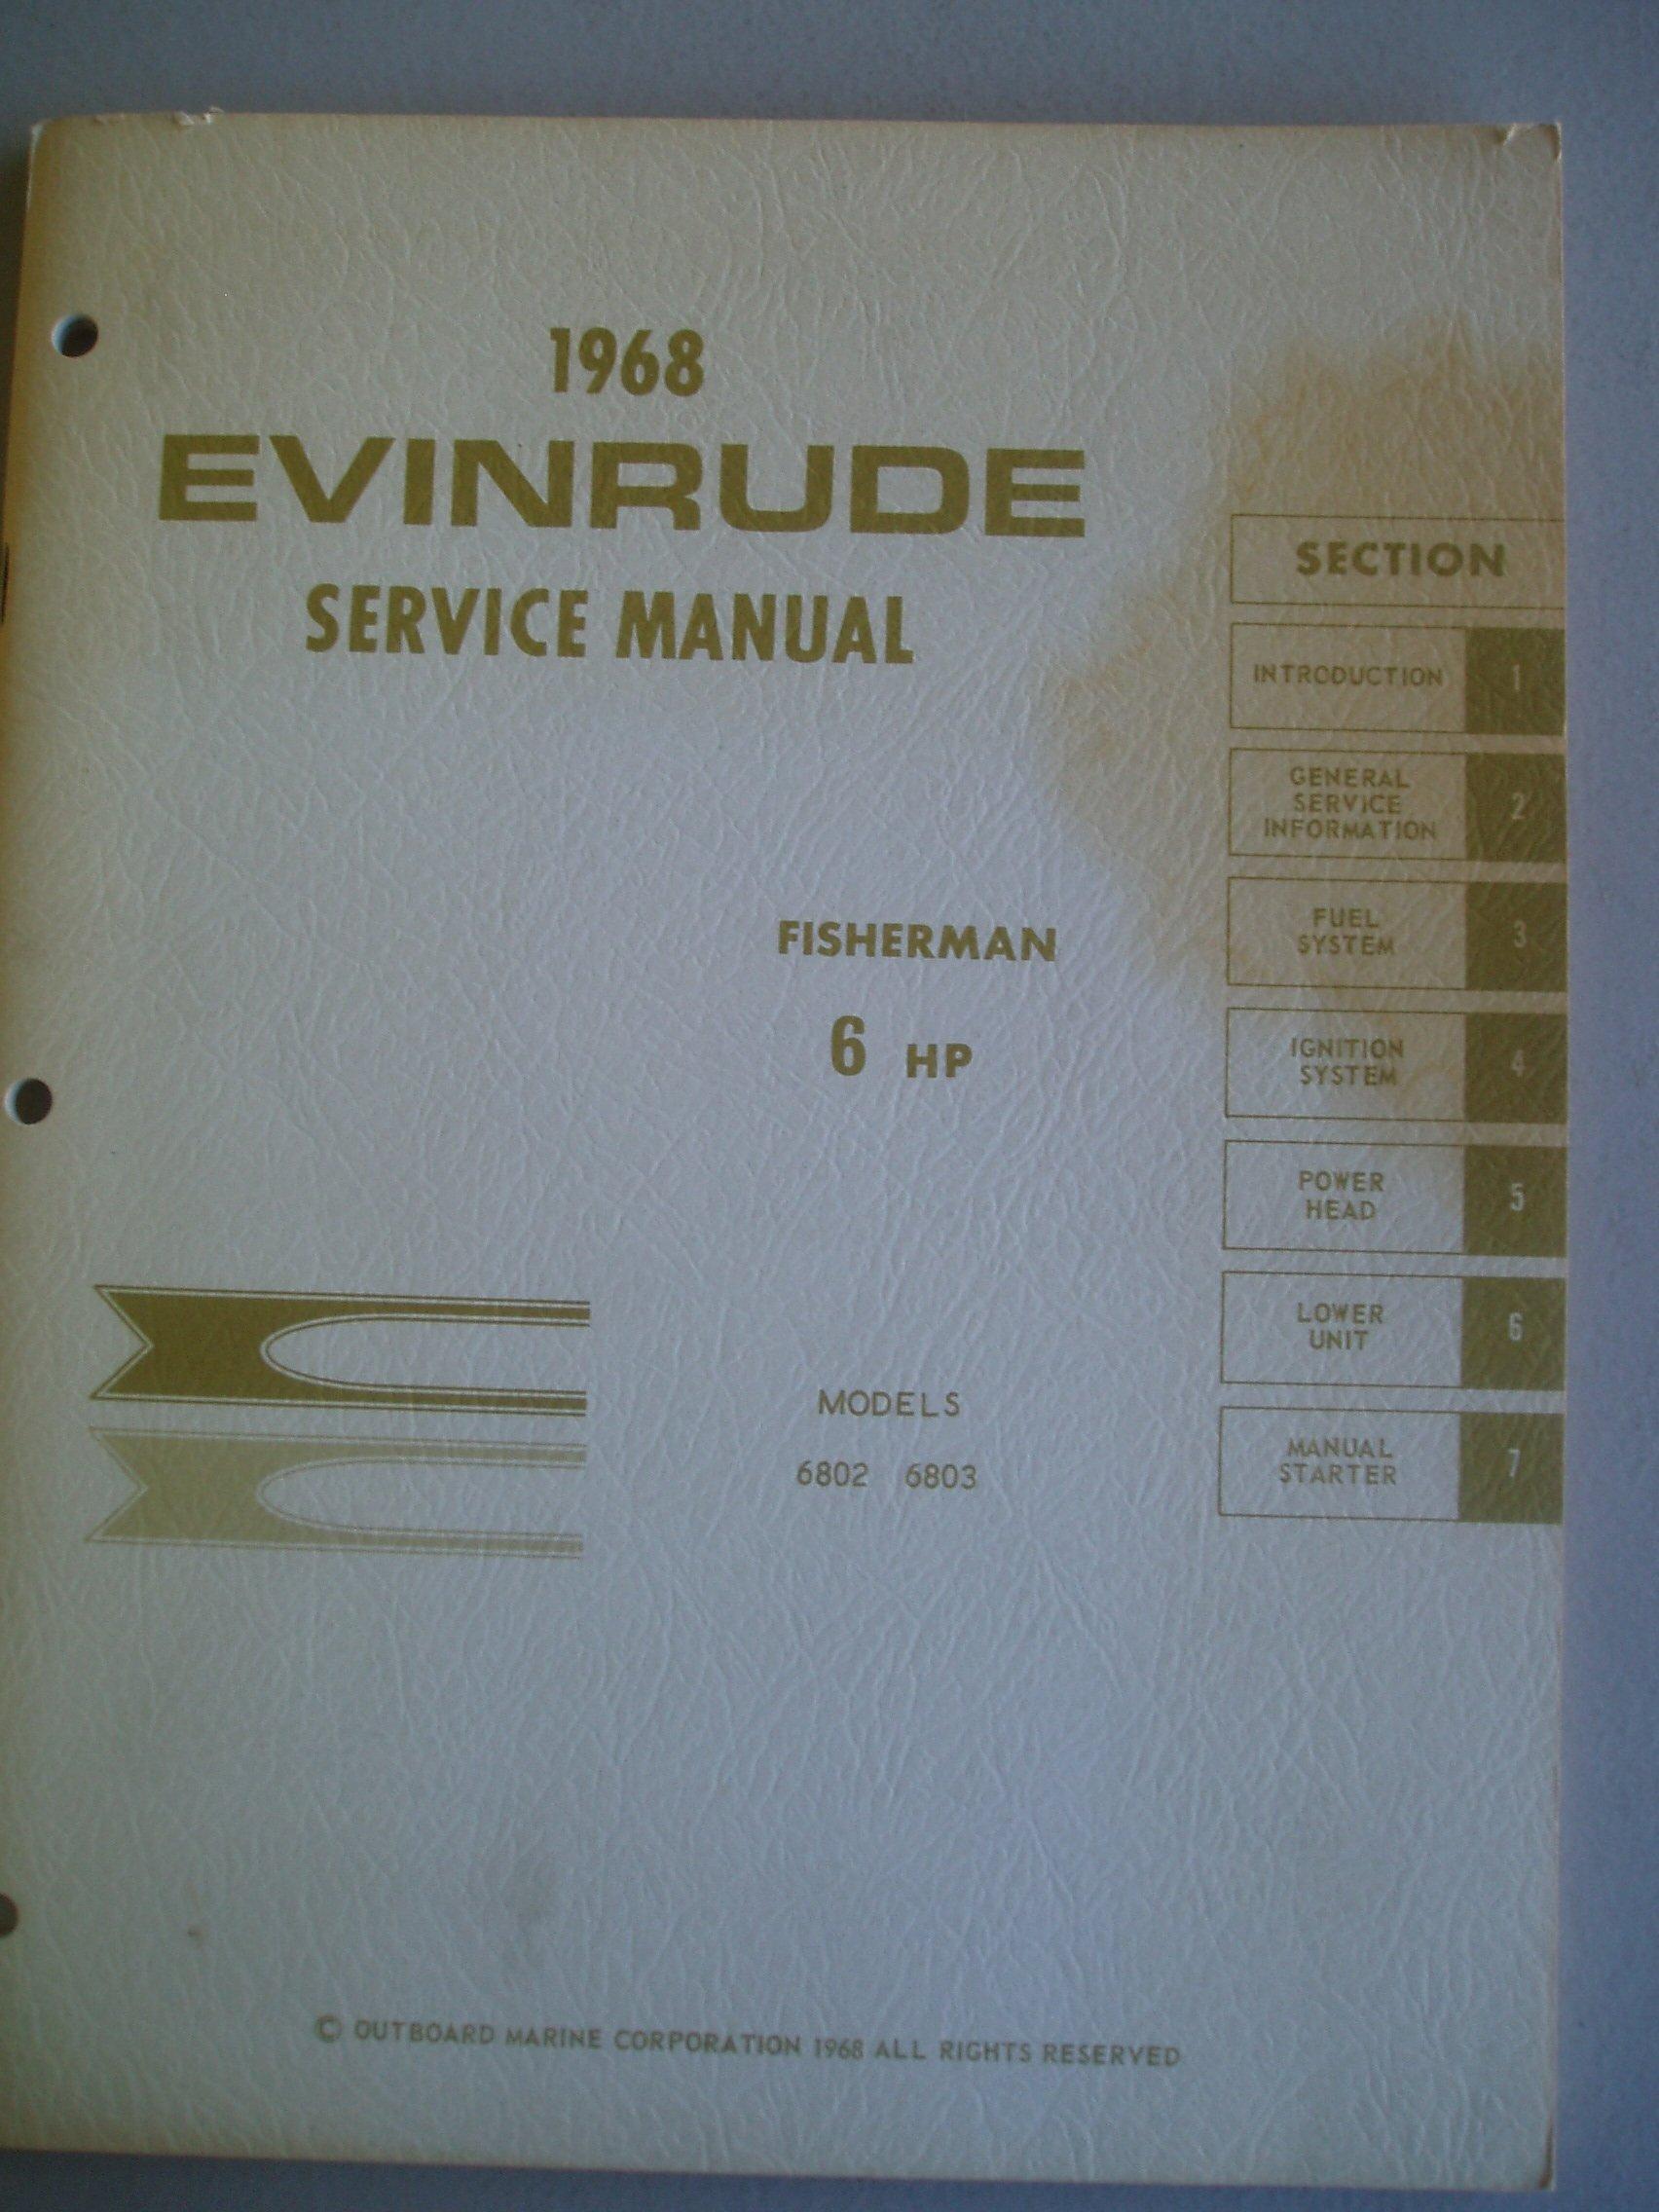 1968 Evinrude Service Manual: Fisherman 6 HP (Models 6802